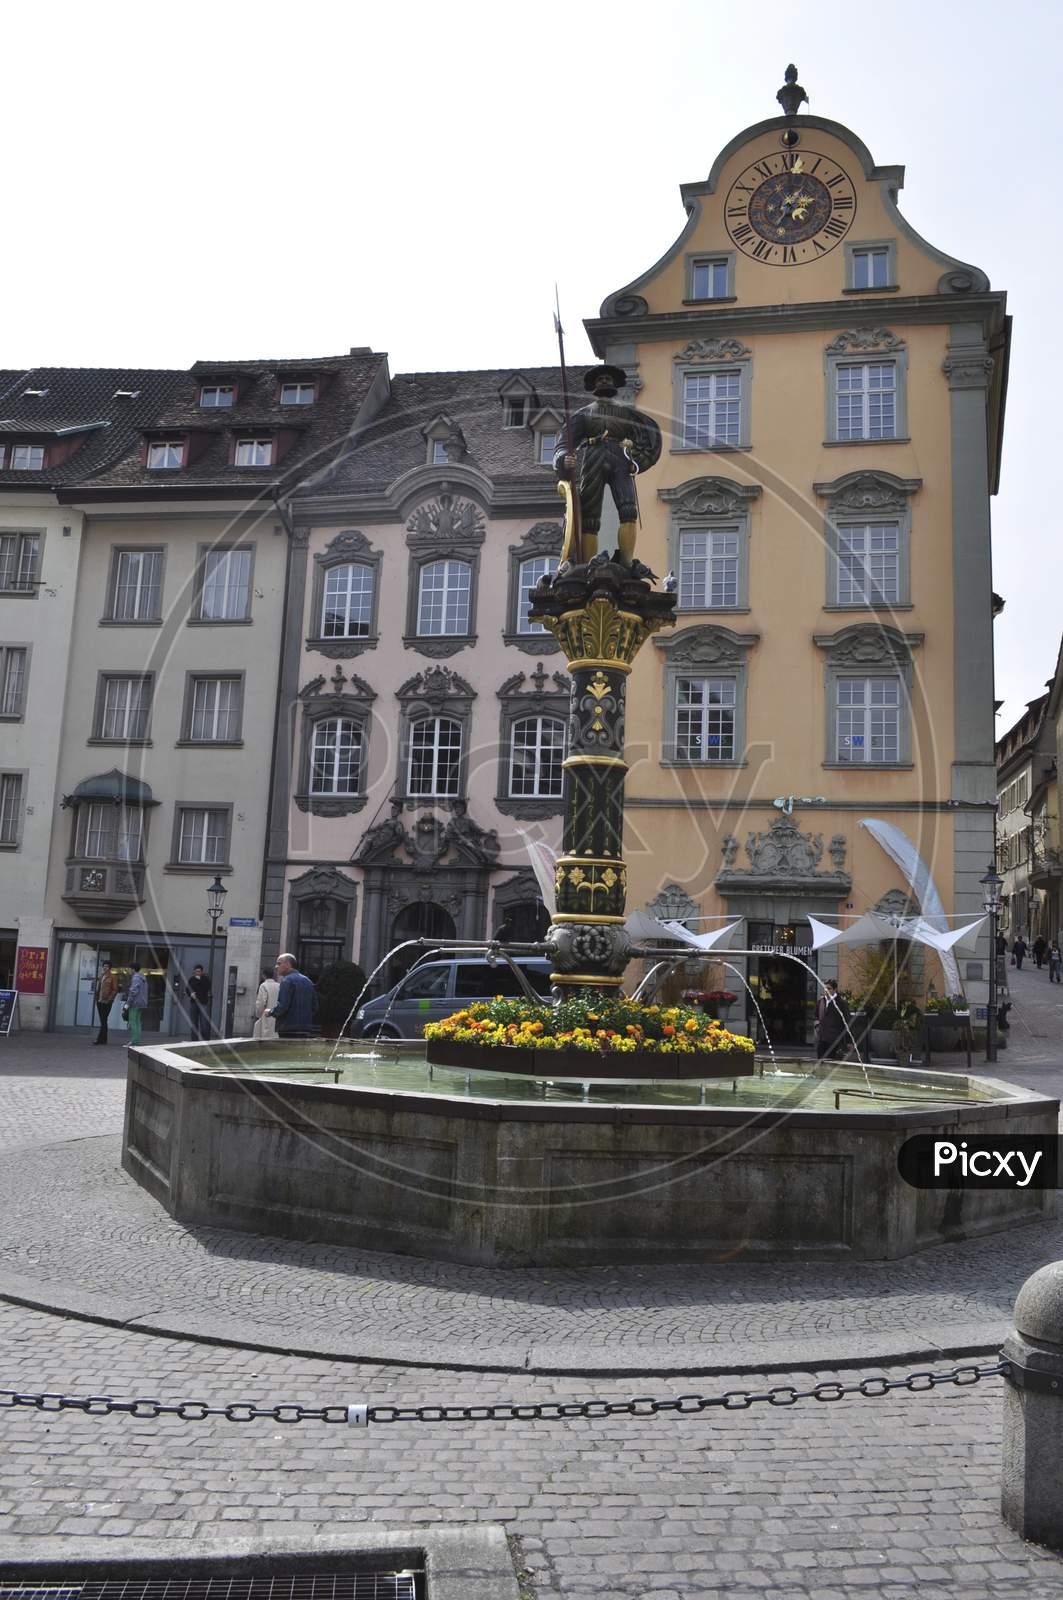 Town square, fountain